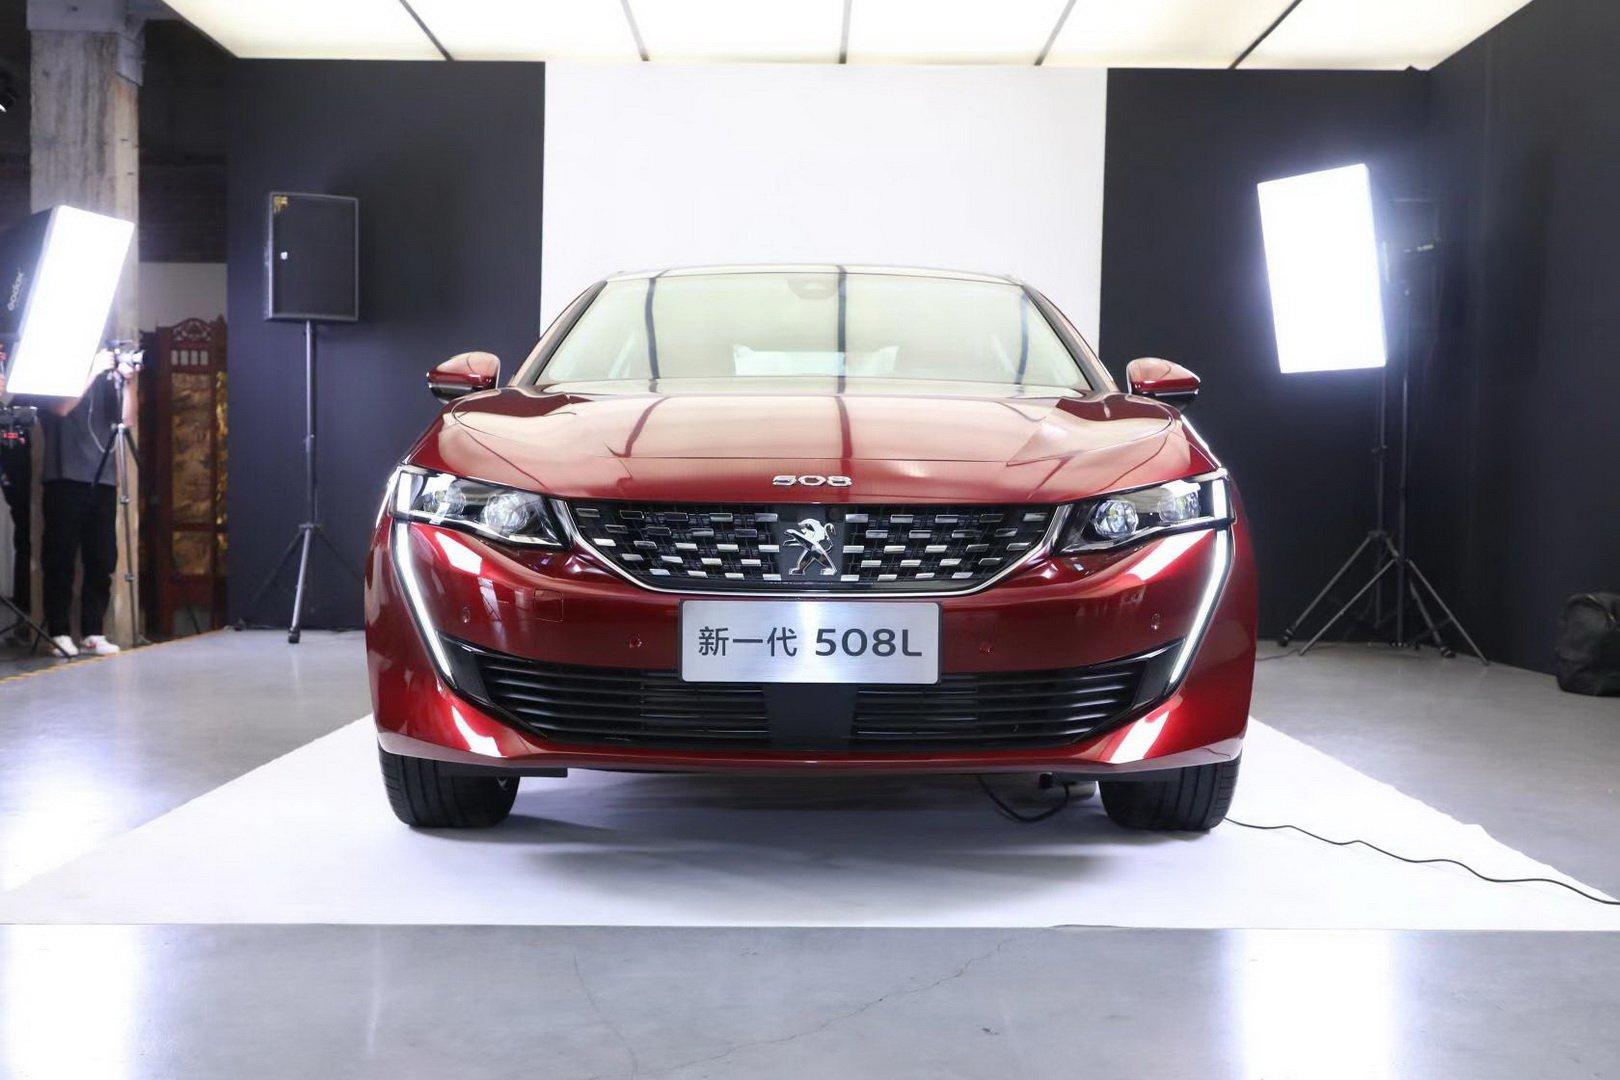 Peugeot 508L 2019 (2)